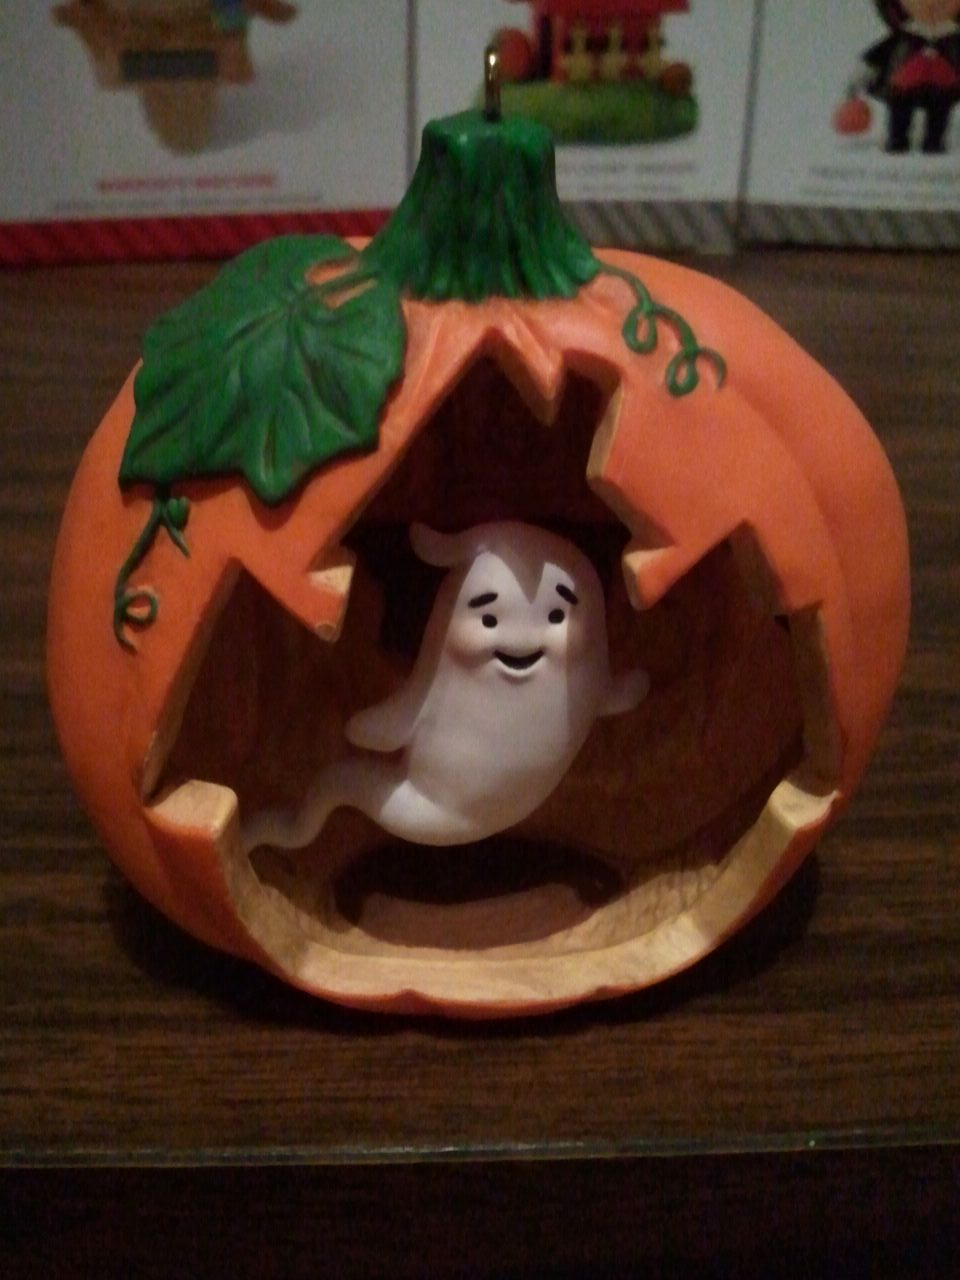 hallmark ornament pumpkin ghost 2014jpg - Hallmark Halloween Decorations